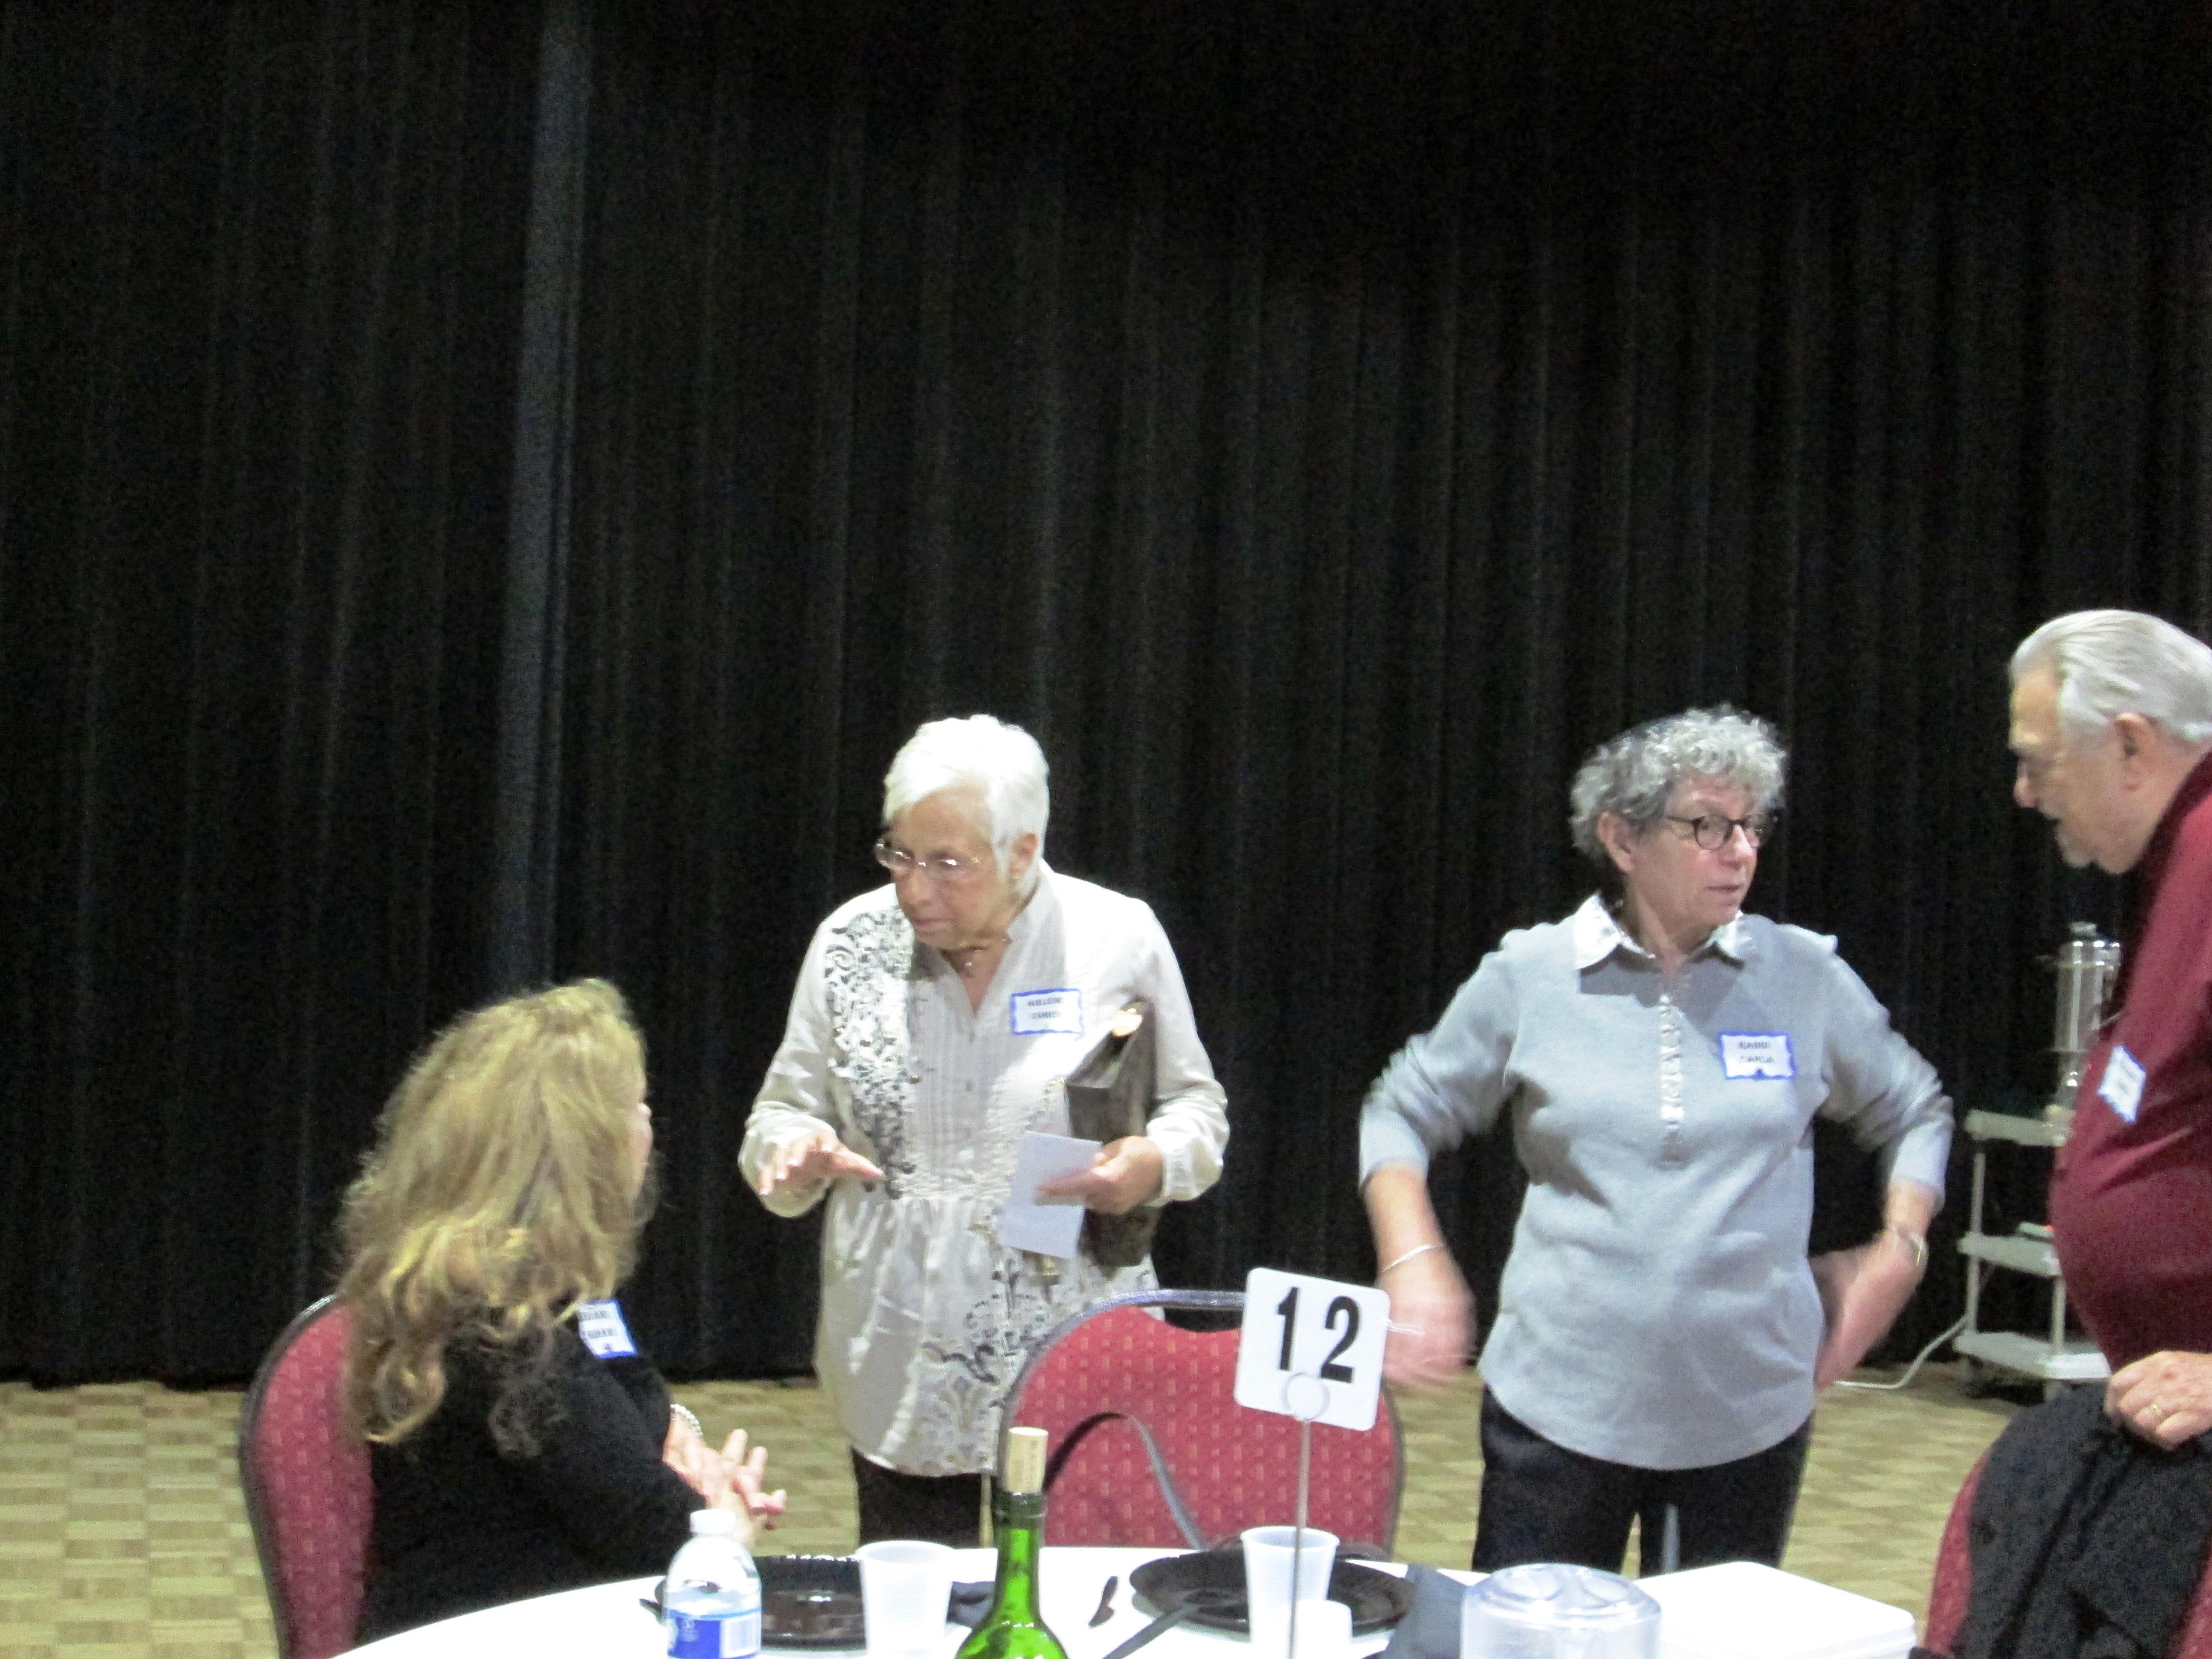 Jeanne Shanin Arlene Cohen Rabbi Freedman Bernie Cohen